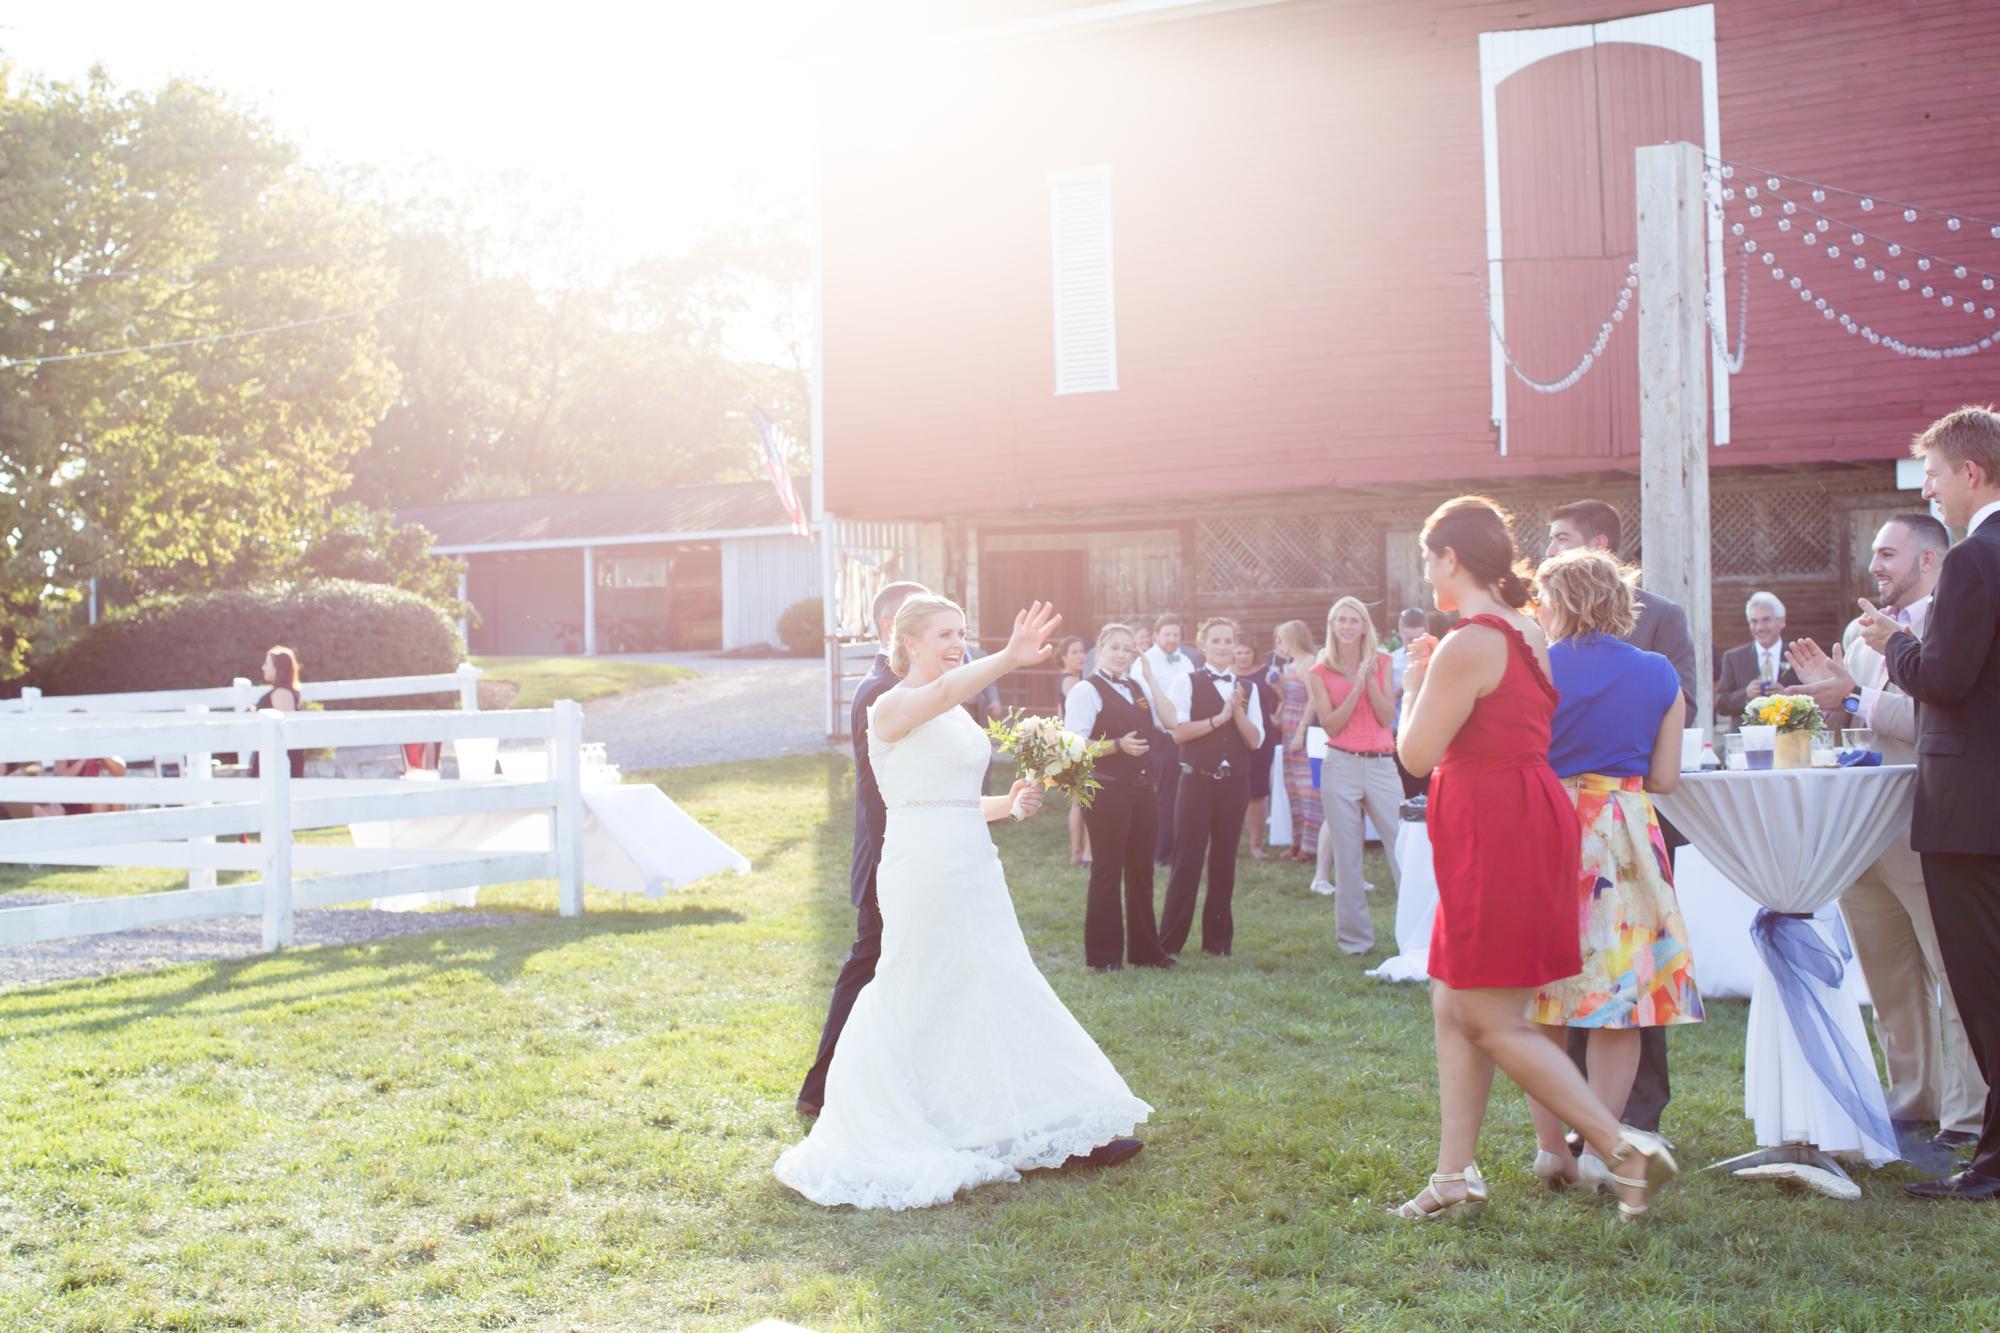 7-Miano Wedding Reception-700_anna grace photography maryland wedding photographer rockland estates.jpg